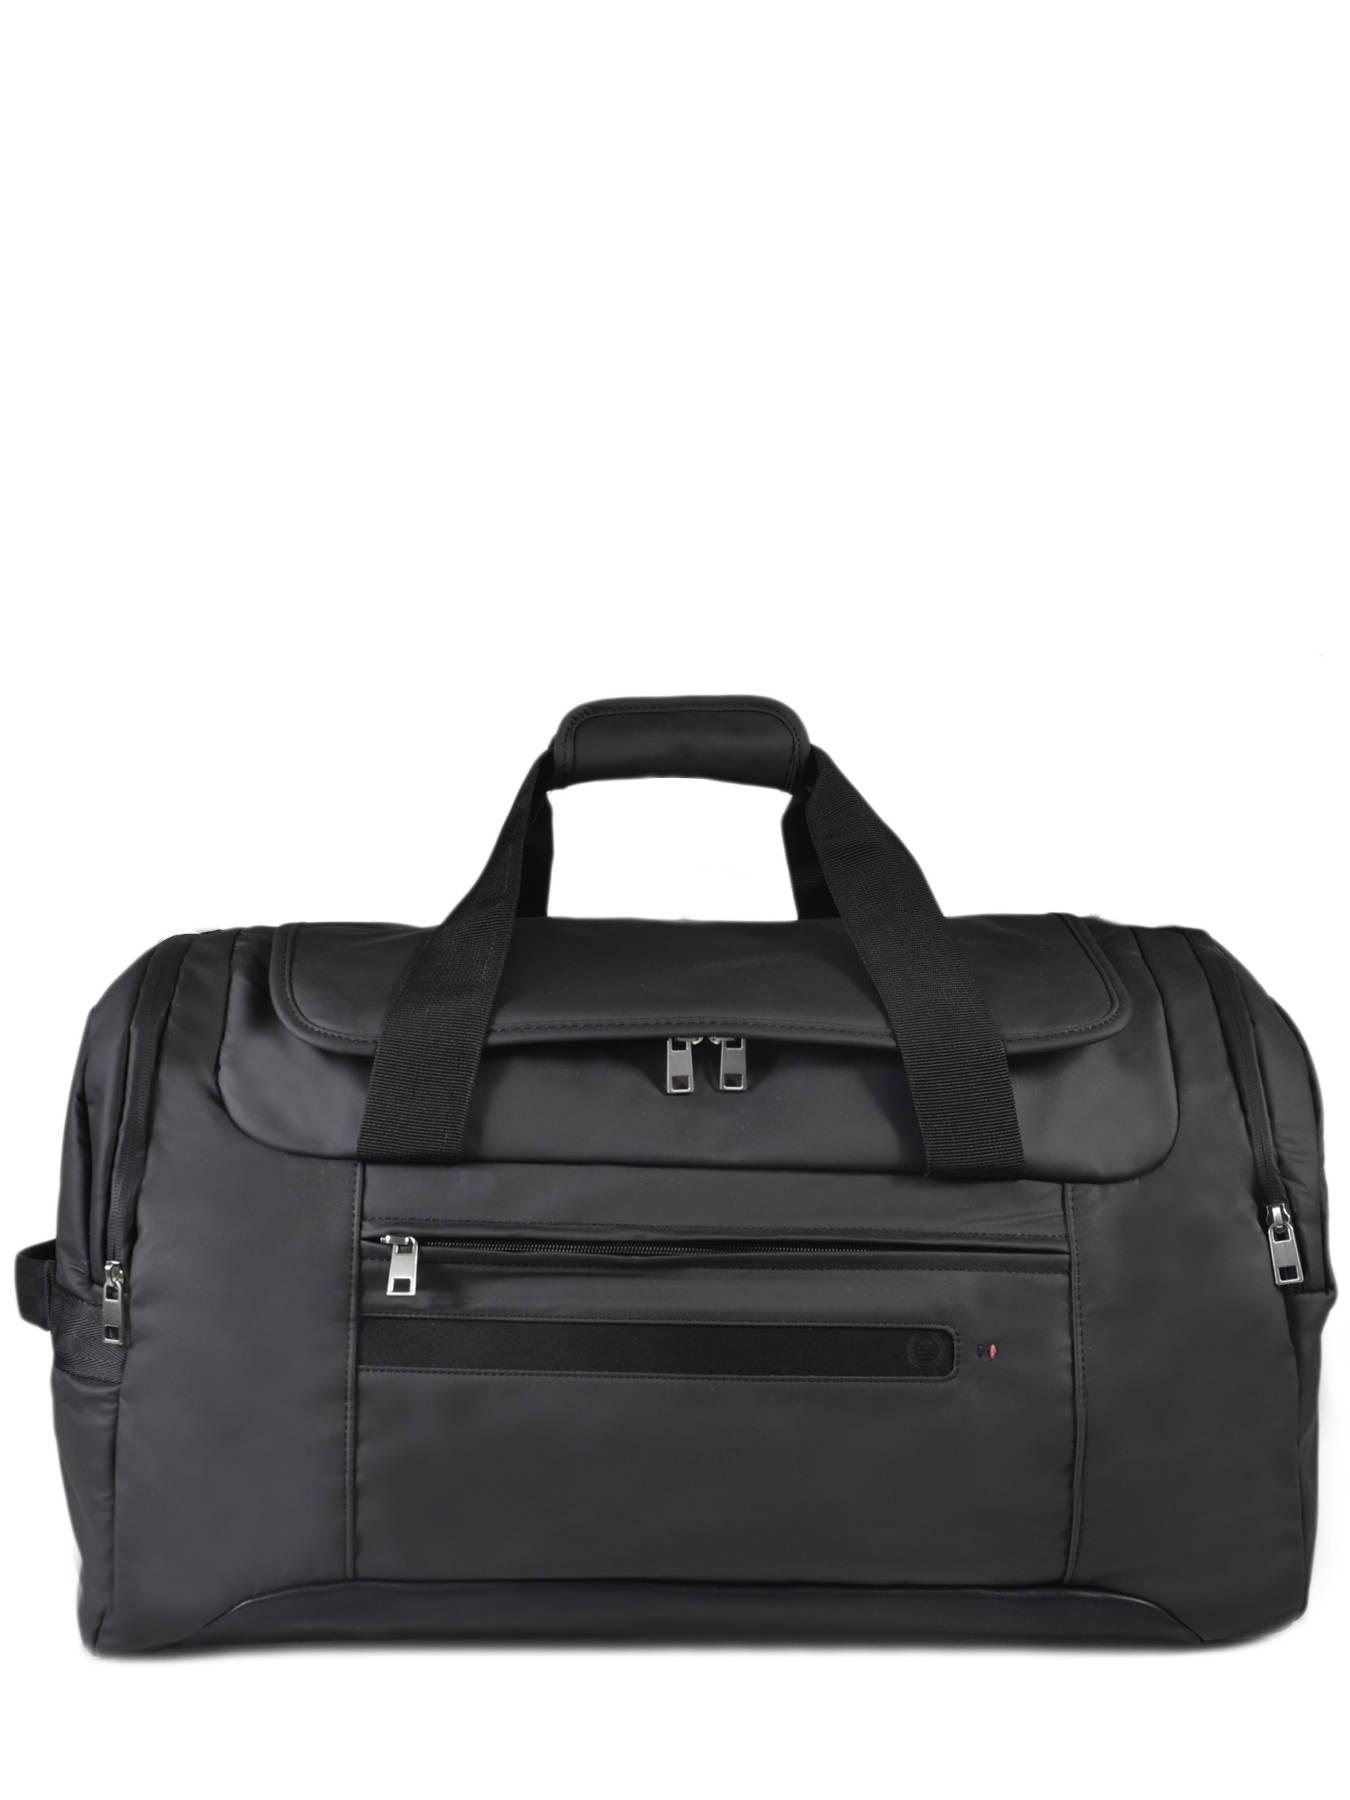 Serge Blanco Travel Bag Rtr 14023 Best Prices